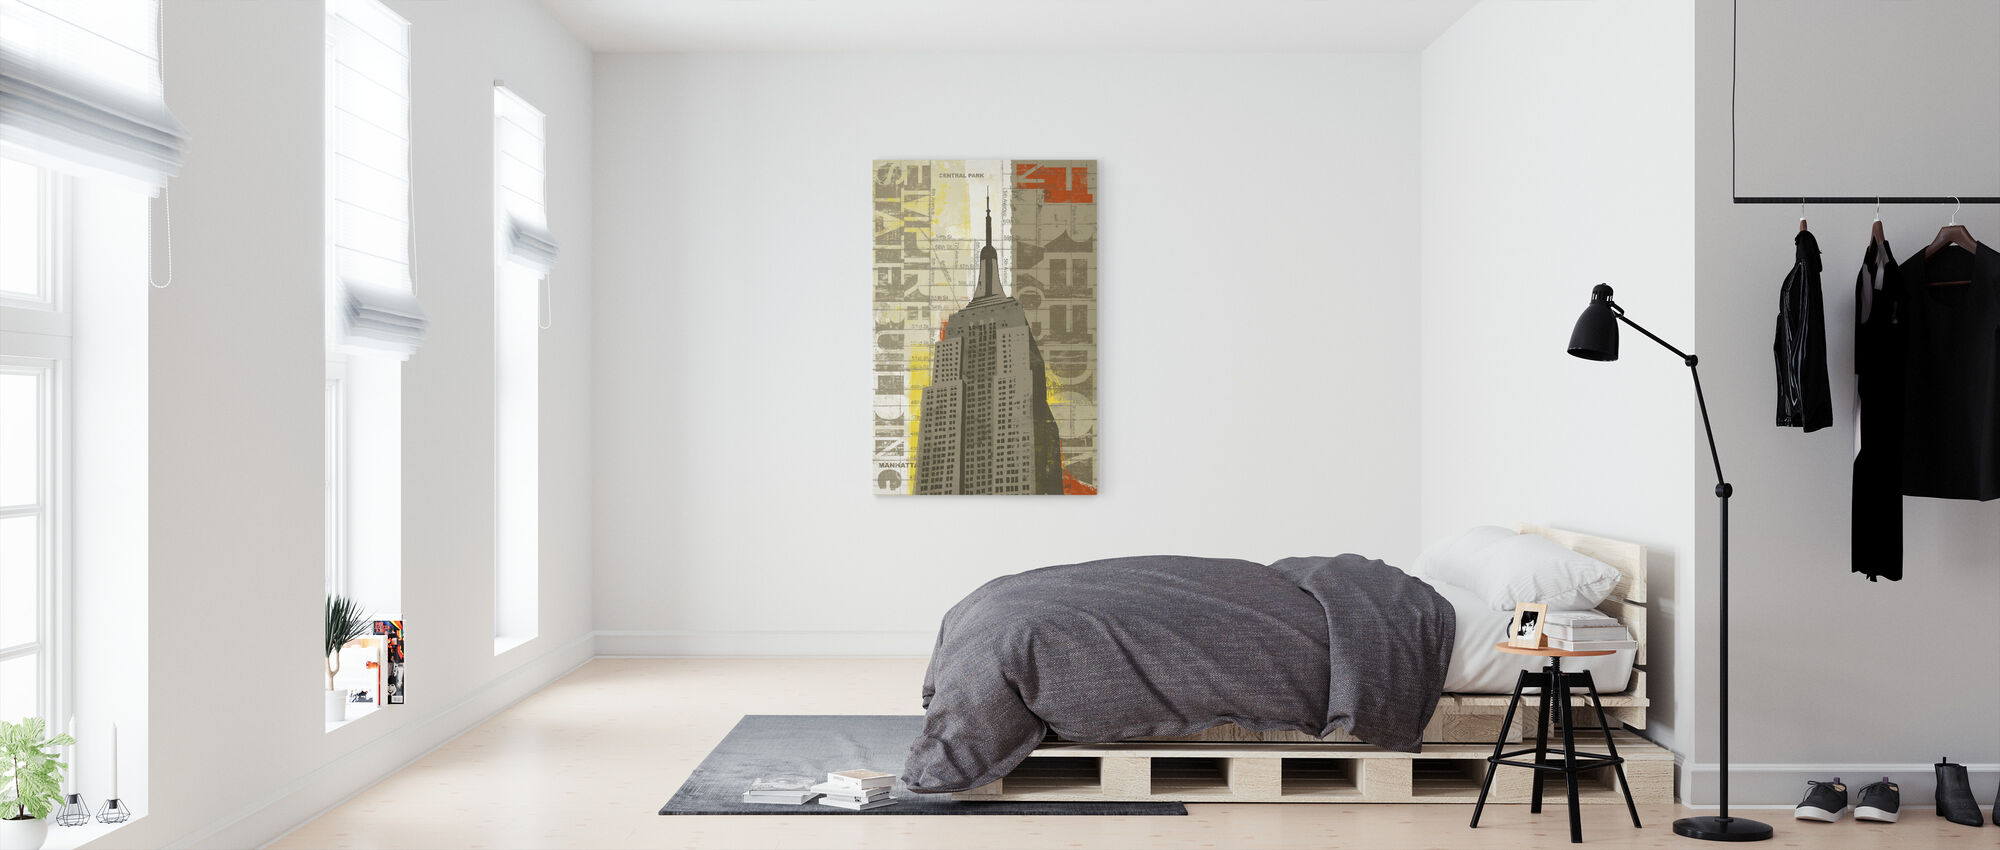 Vrijheid - Canvas print - Slaapkamer